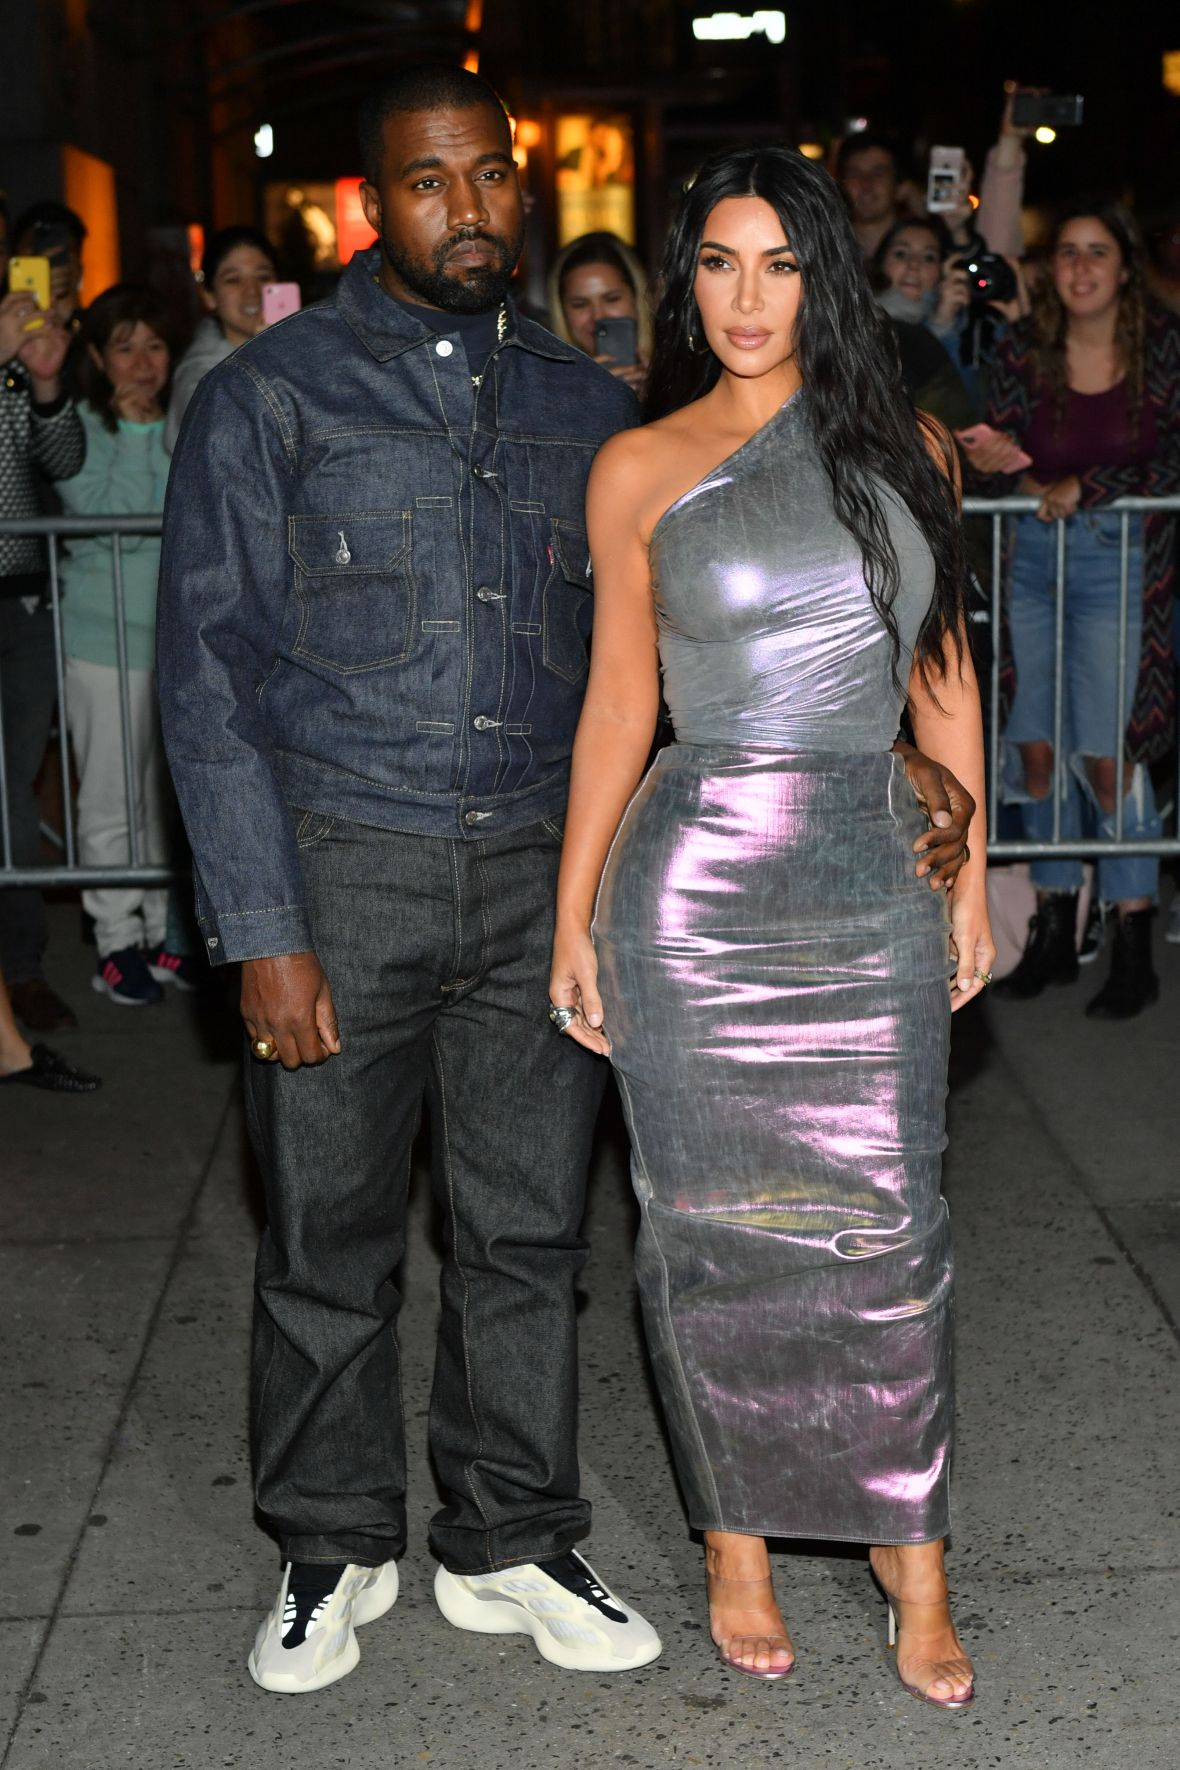 Kim Kardashian Breaks Her Silence on Kanye West Marital Drama